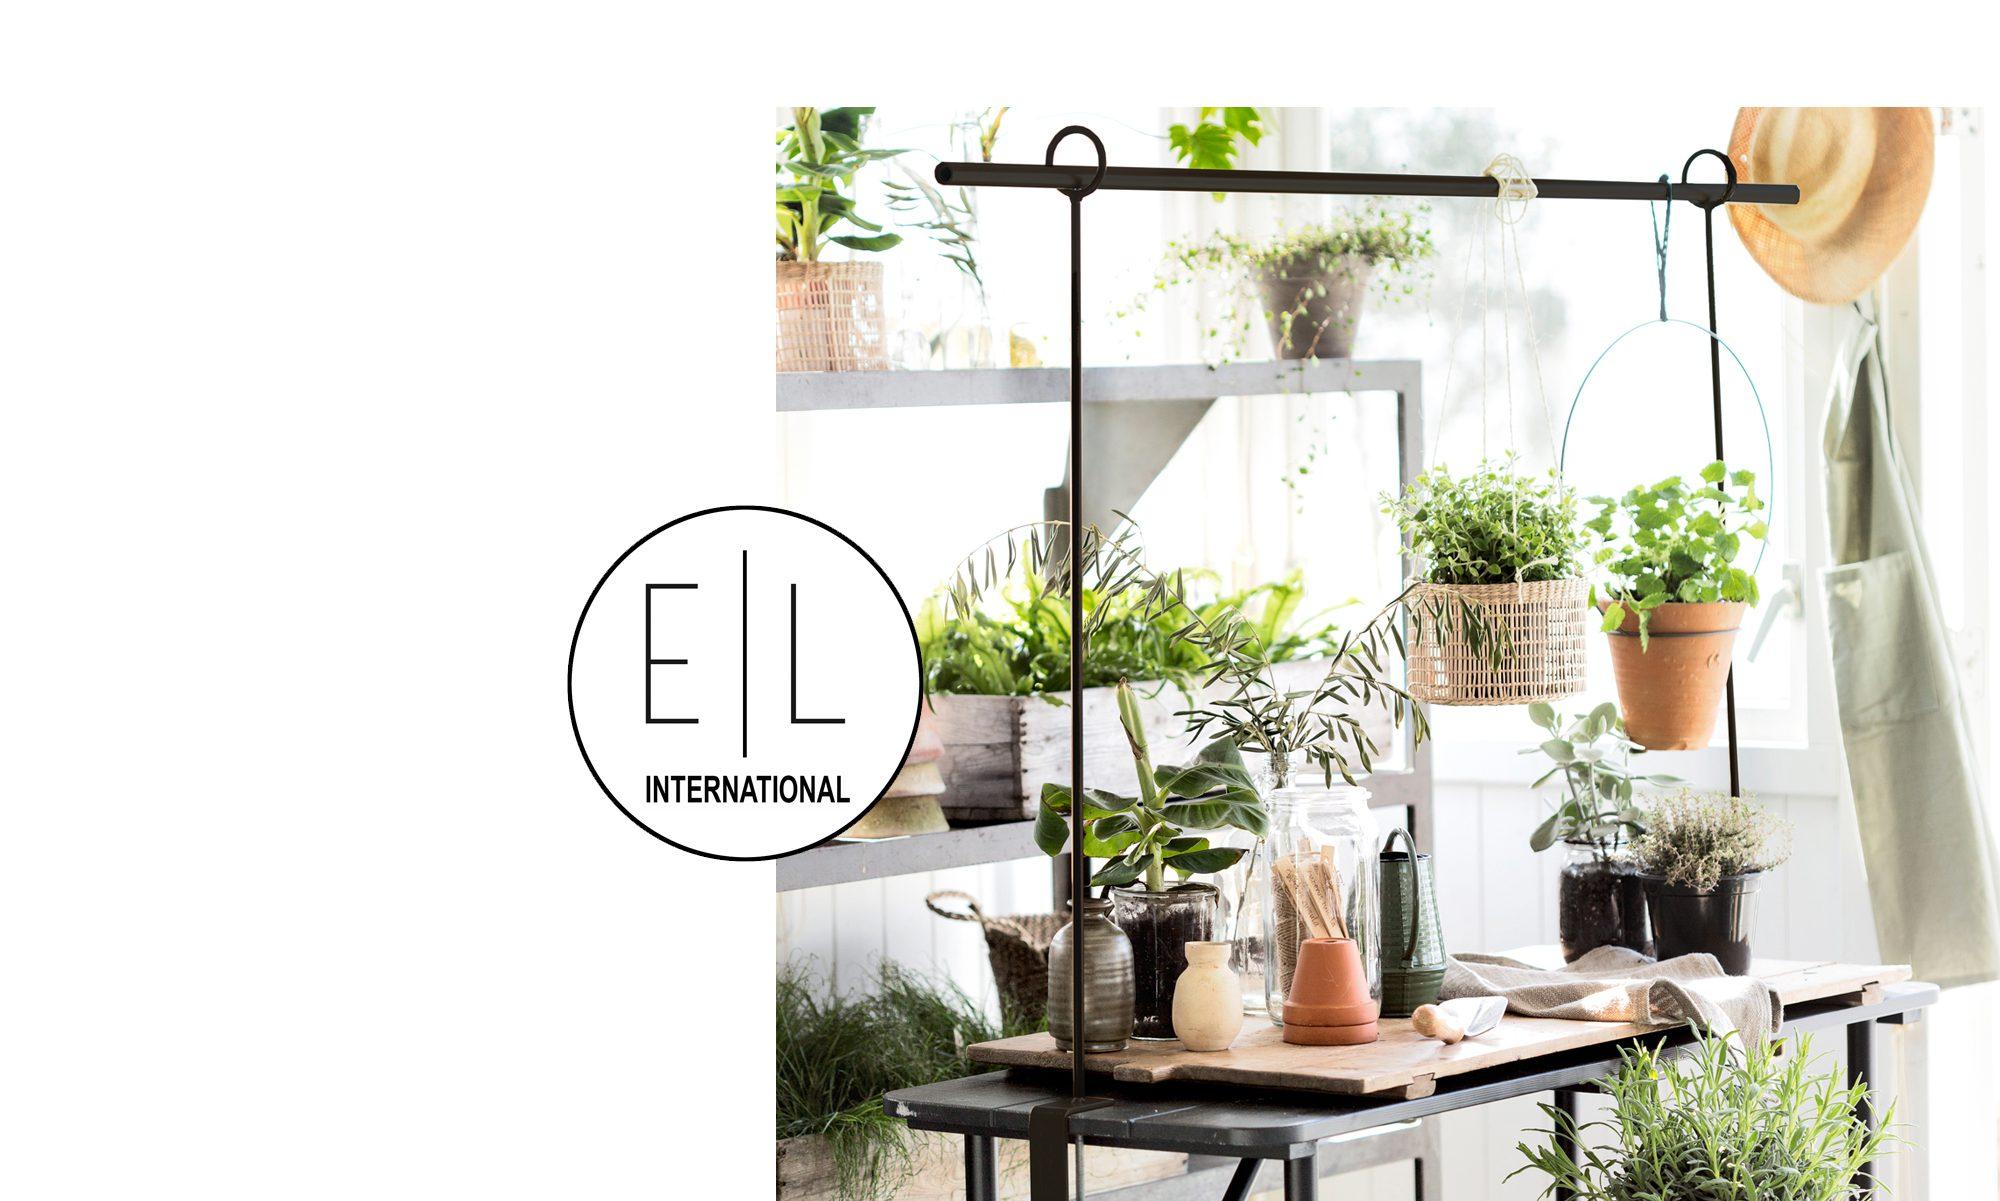 E|L INTERNATIONAL